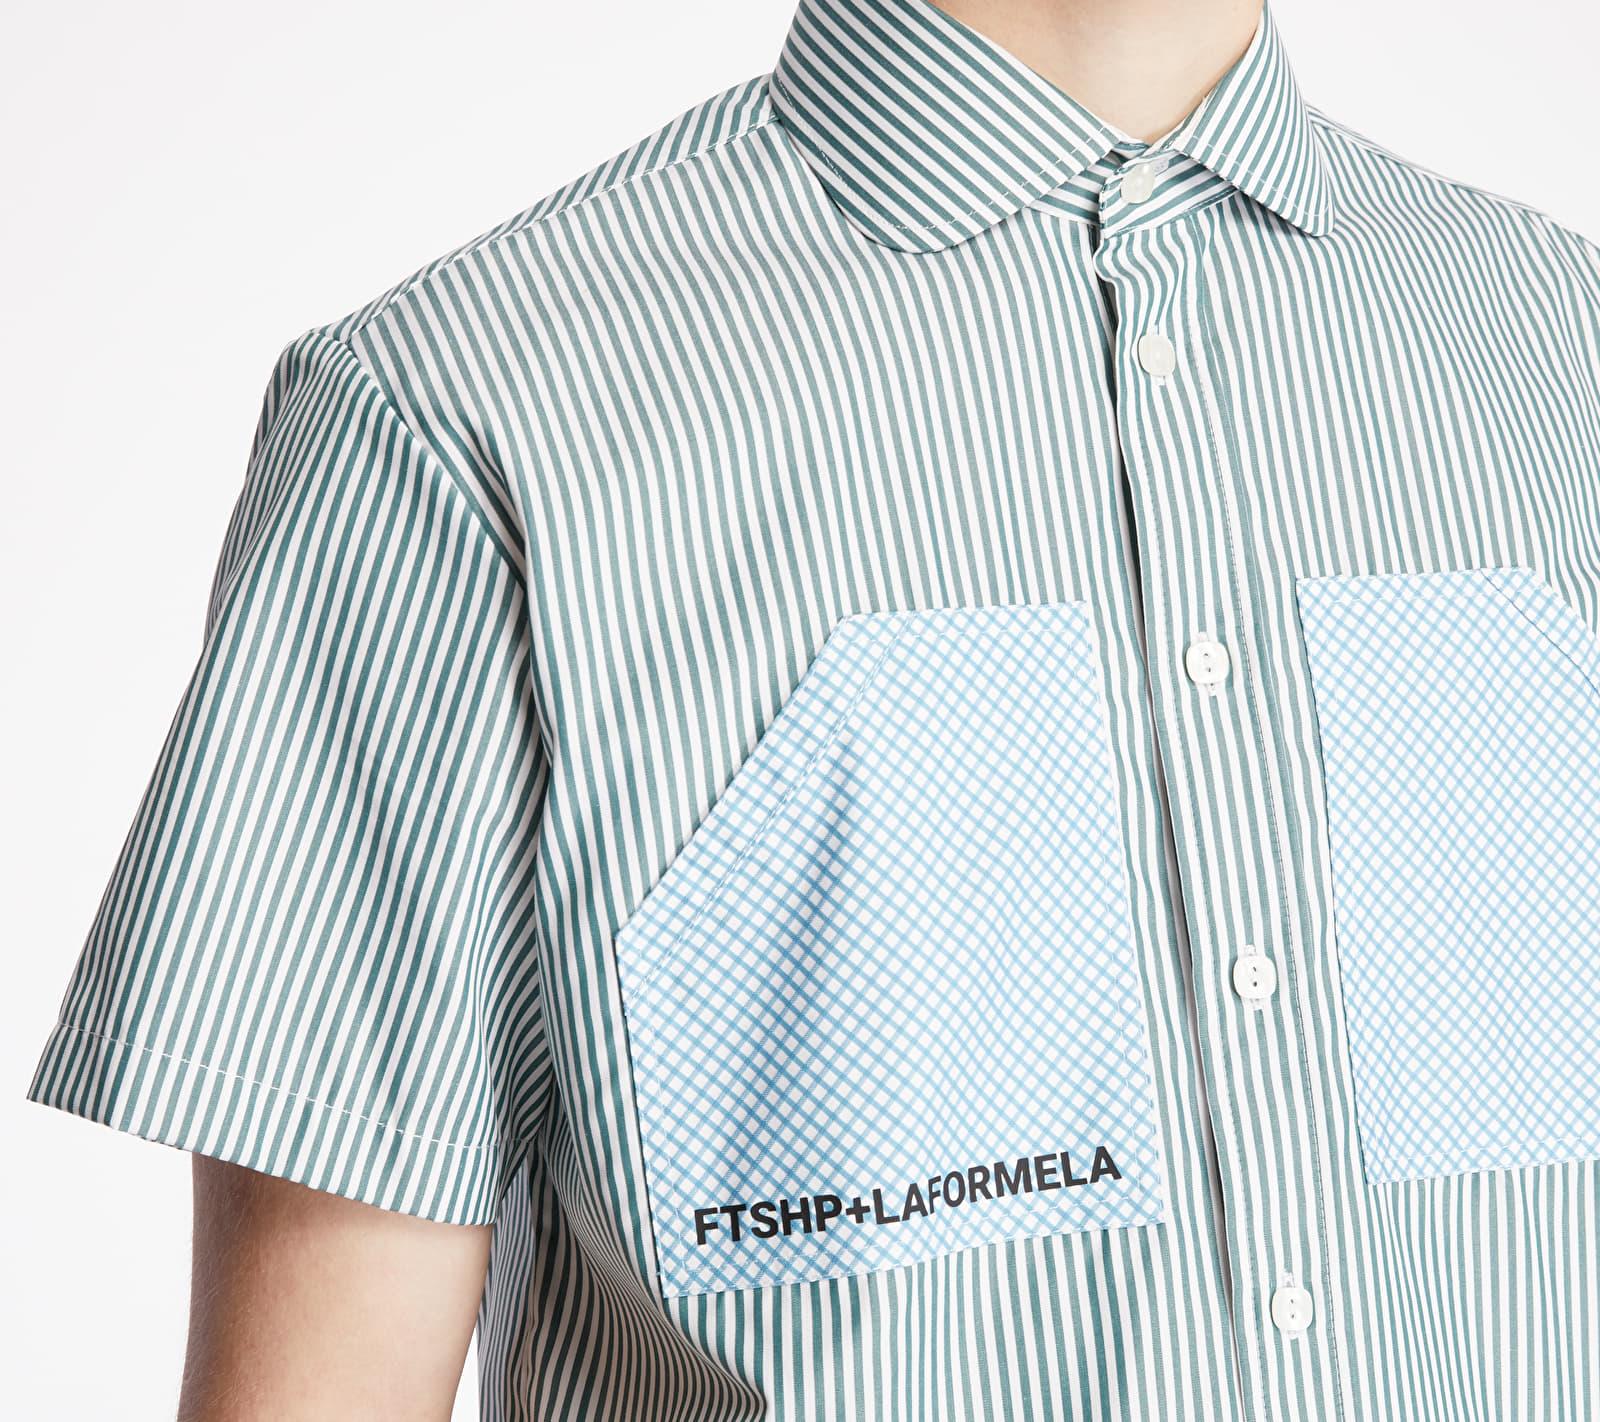 "FTSHP + LAFORMELA ""No Season"" Shortsleeve Shirt Green"